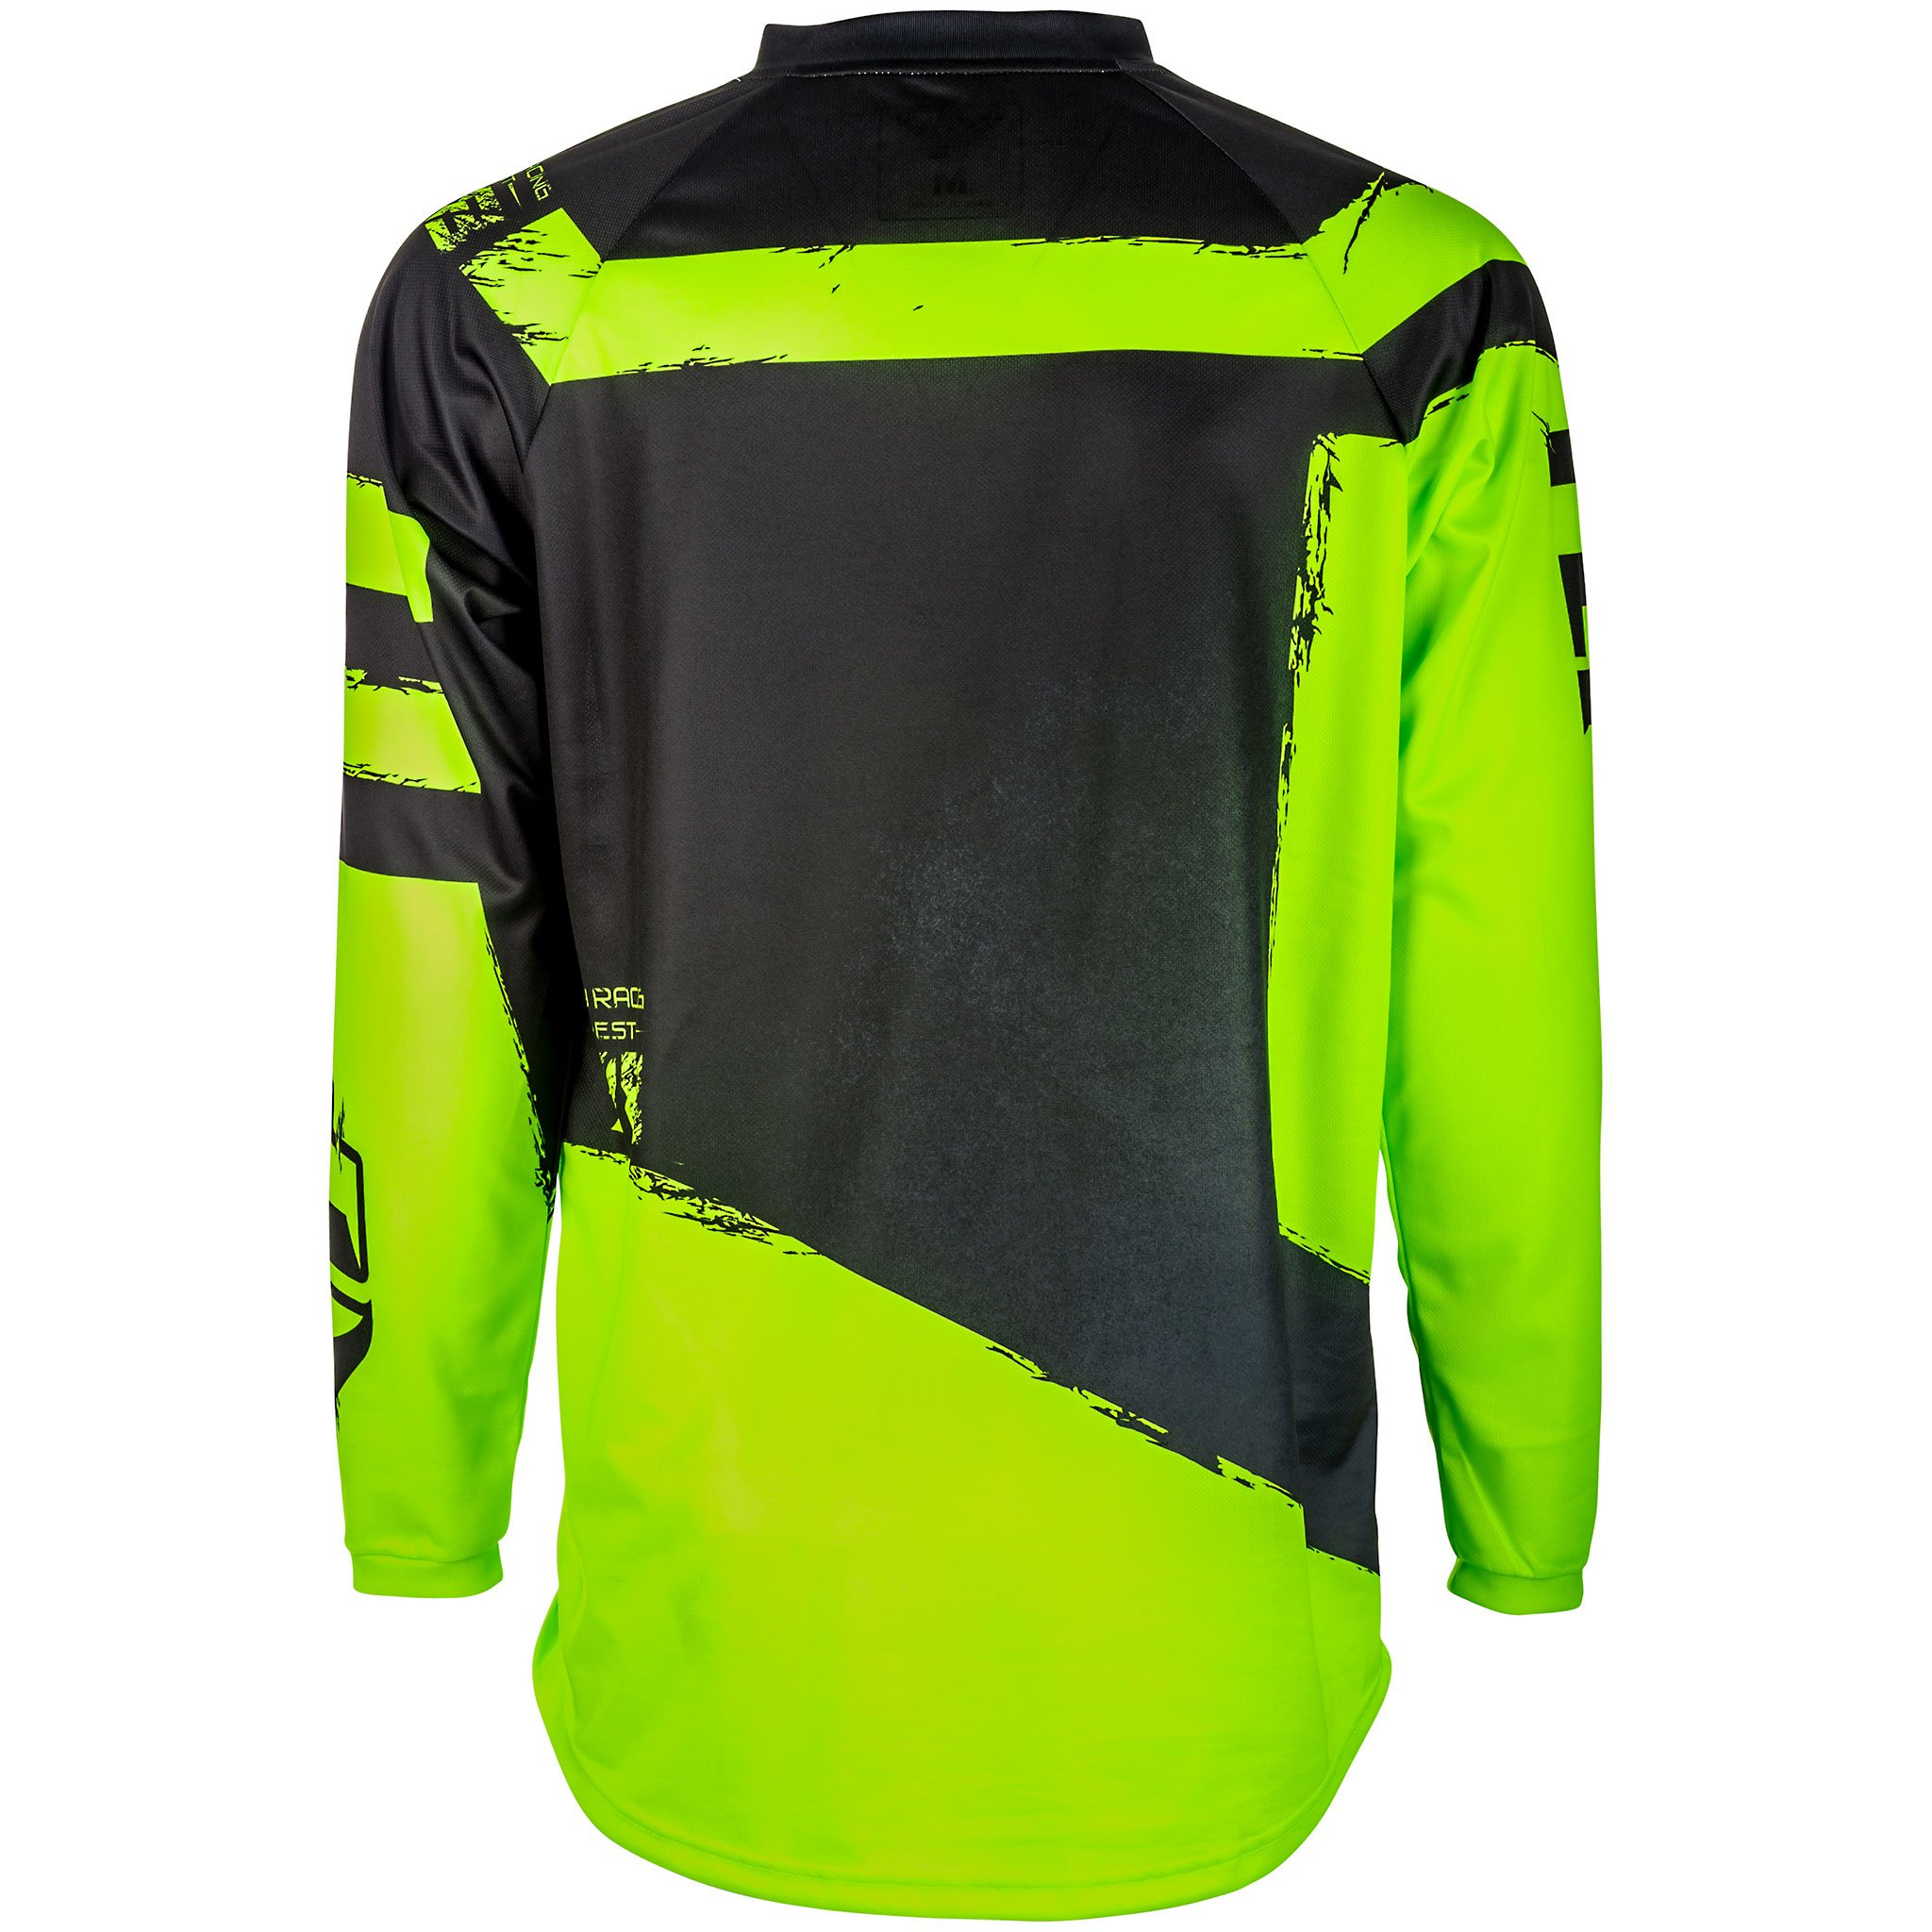 Fly Racing Men's Jersey (Black/Hi-Vis, X-Large)